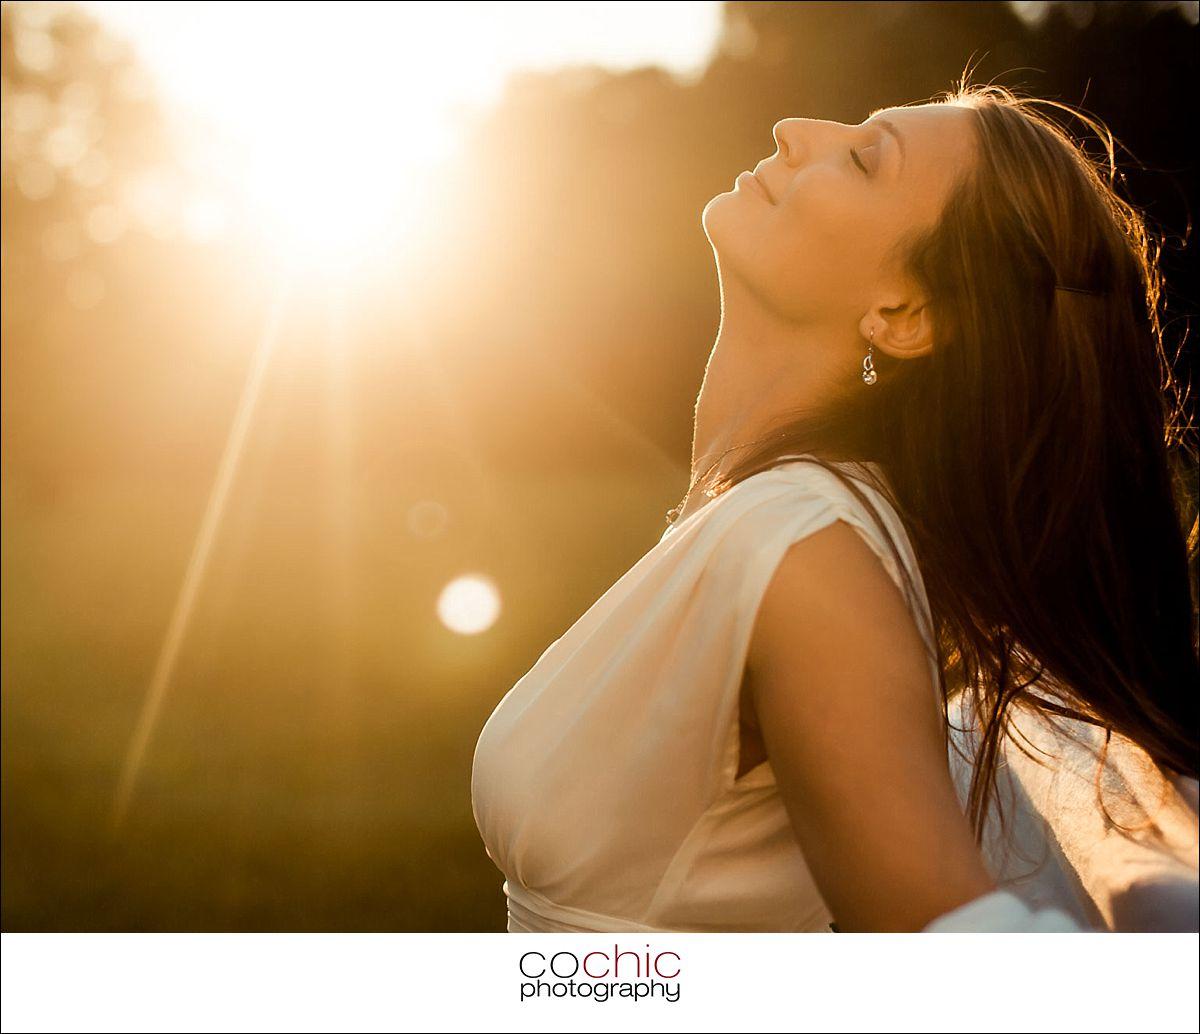 13-fotoshooting wien porträtfotos fotograf schloss laxenburg natur wiese gegenlicht-20120907-_KO_0816